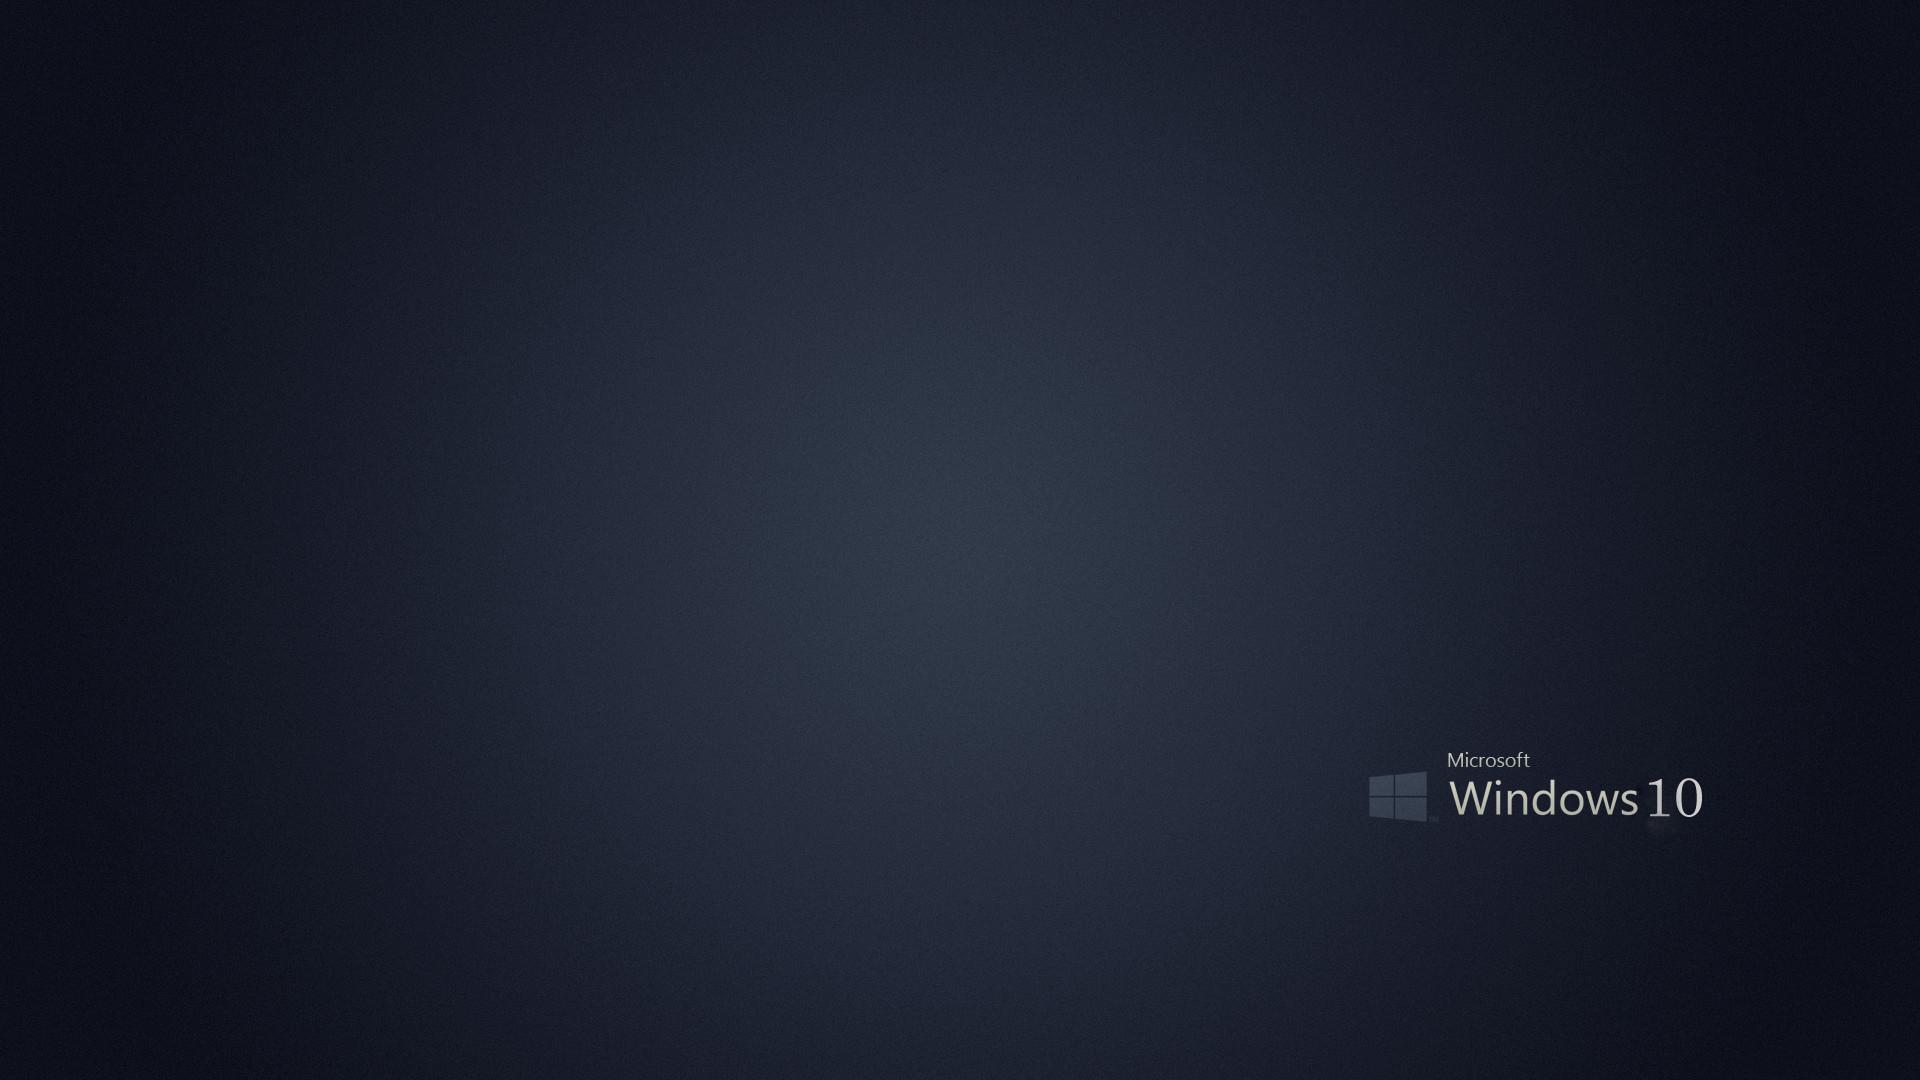 1920x1080 Windows 10 HD Wallpapers